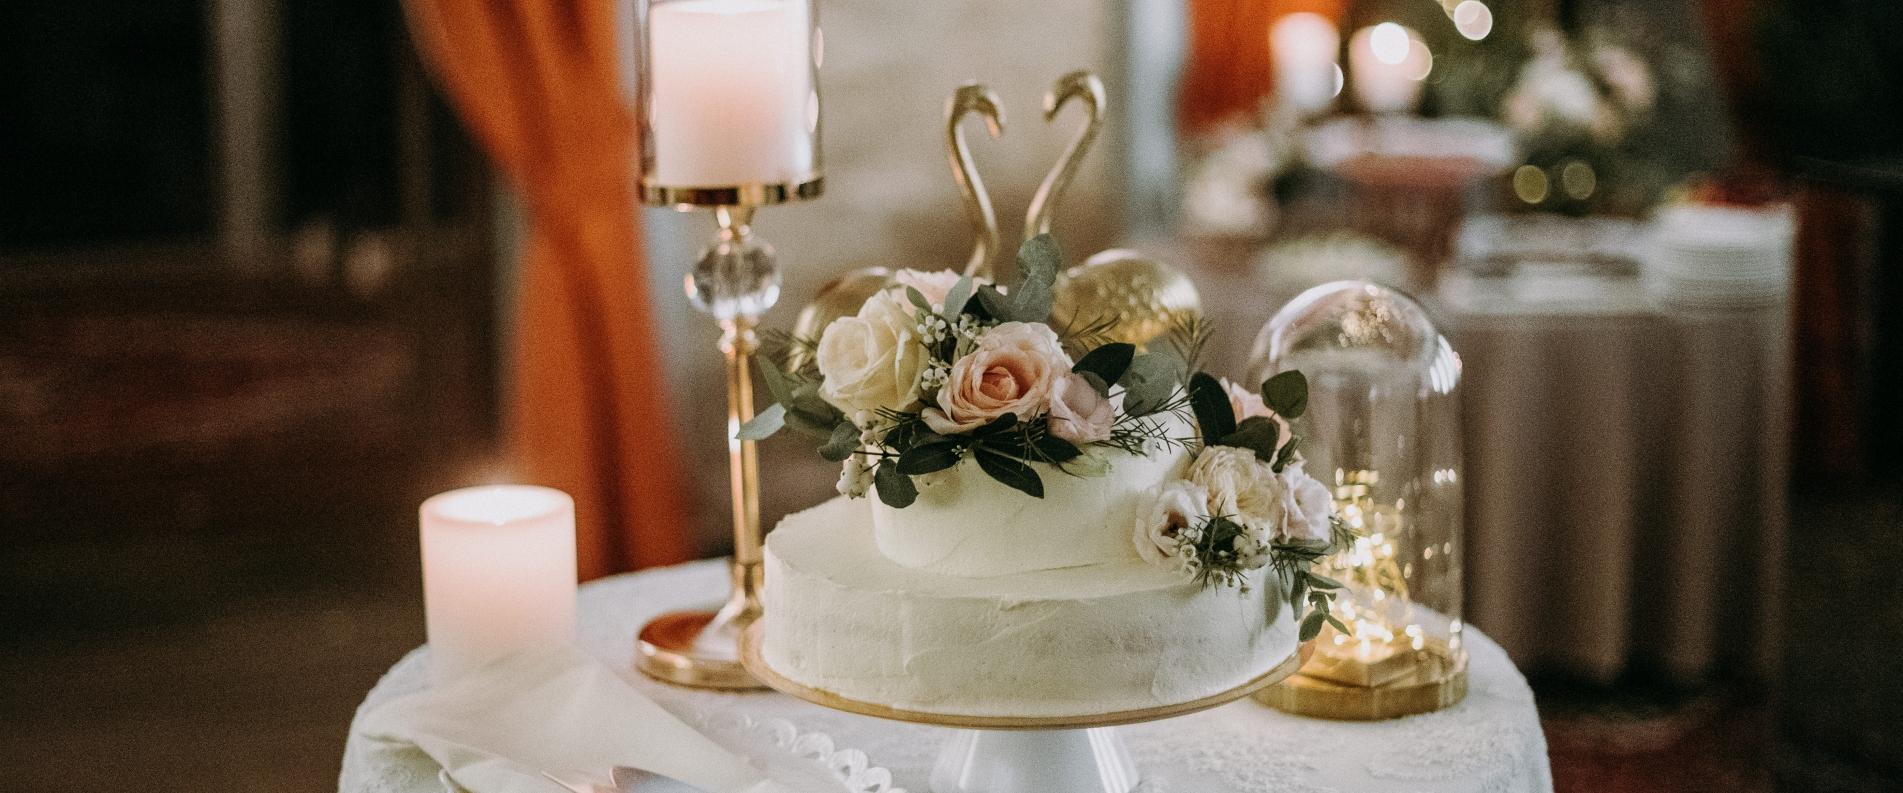 dace-haralds-by-miks-sels-weddings-853_5813-976e37bcd0b01f85116fdebec91384e9.jpg